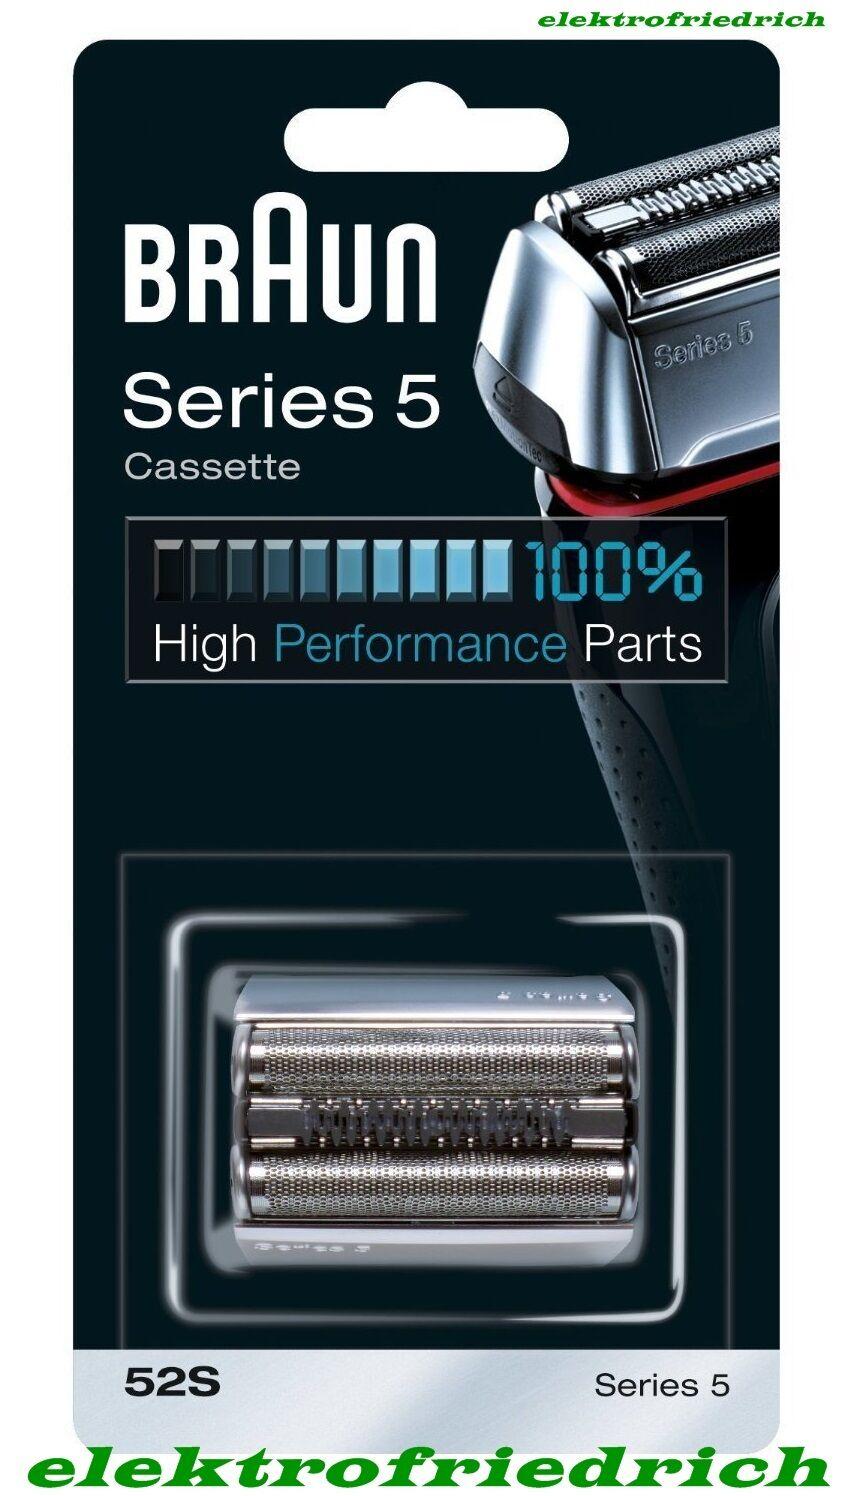 BRAUN Scherkopf 52s Series 5 Kombipack - Cassette NEUOVP 5090cc 5070cc etc